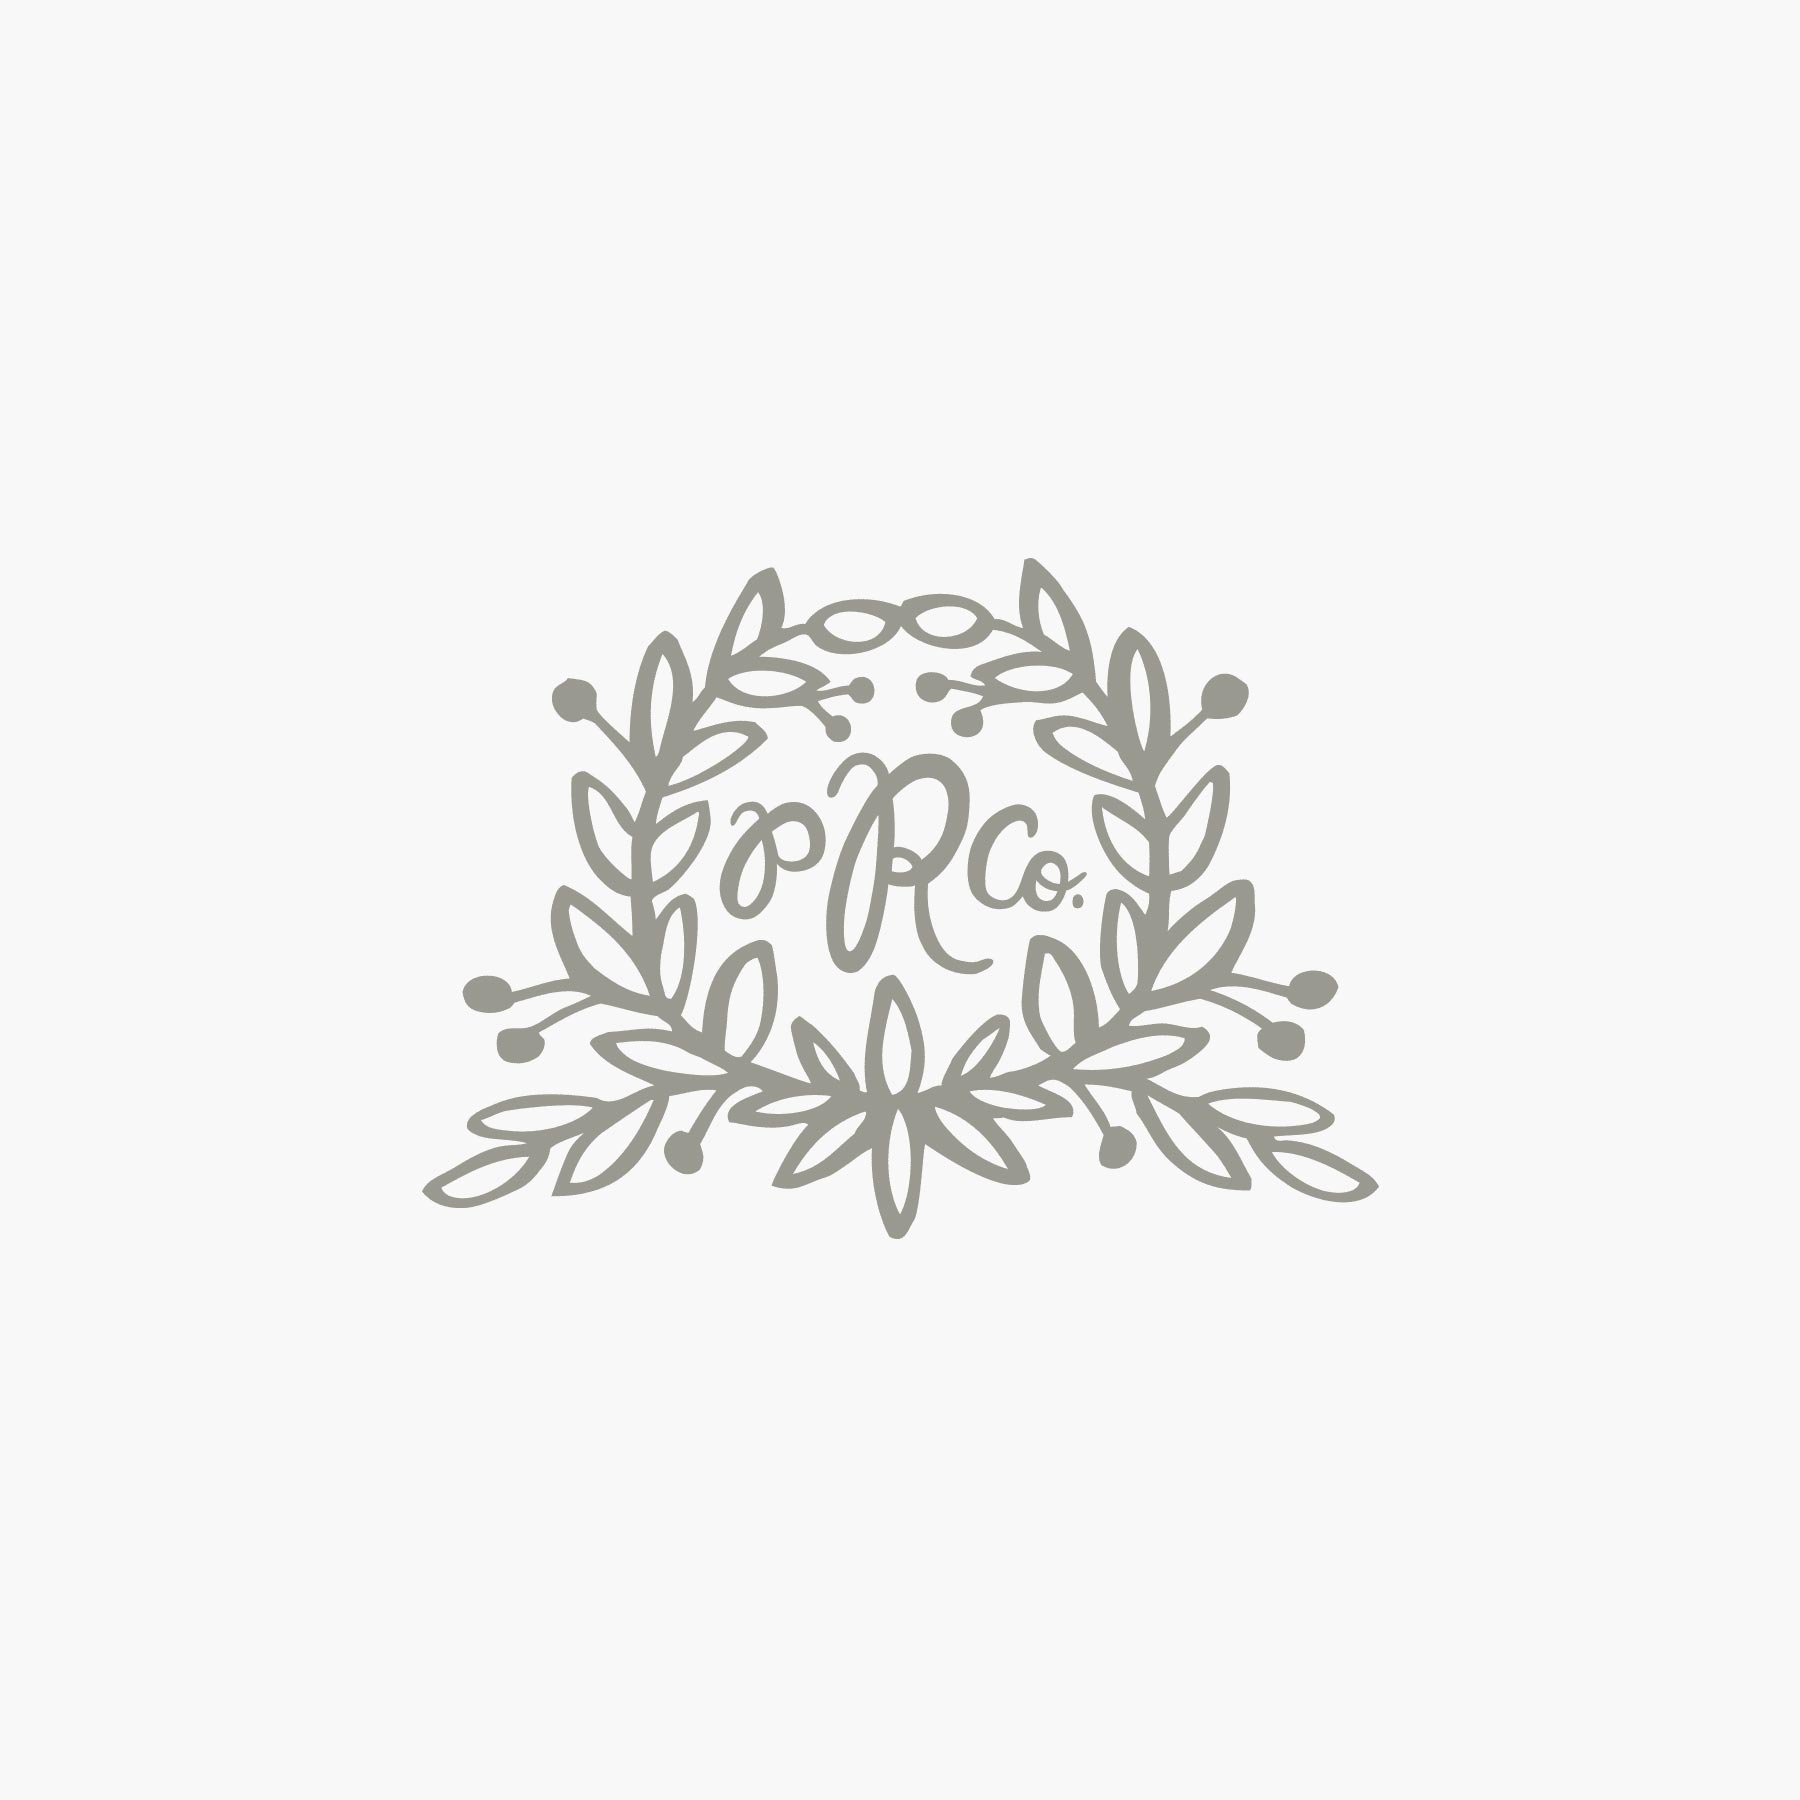 Blush Personalized Flat Notes- Shanghai Garden